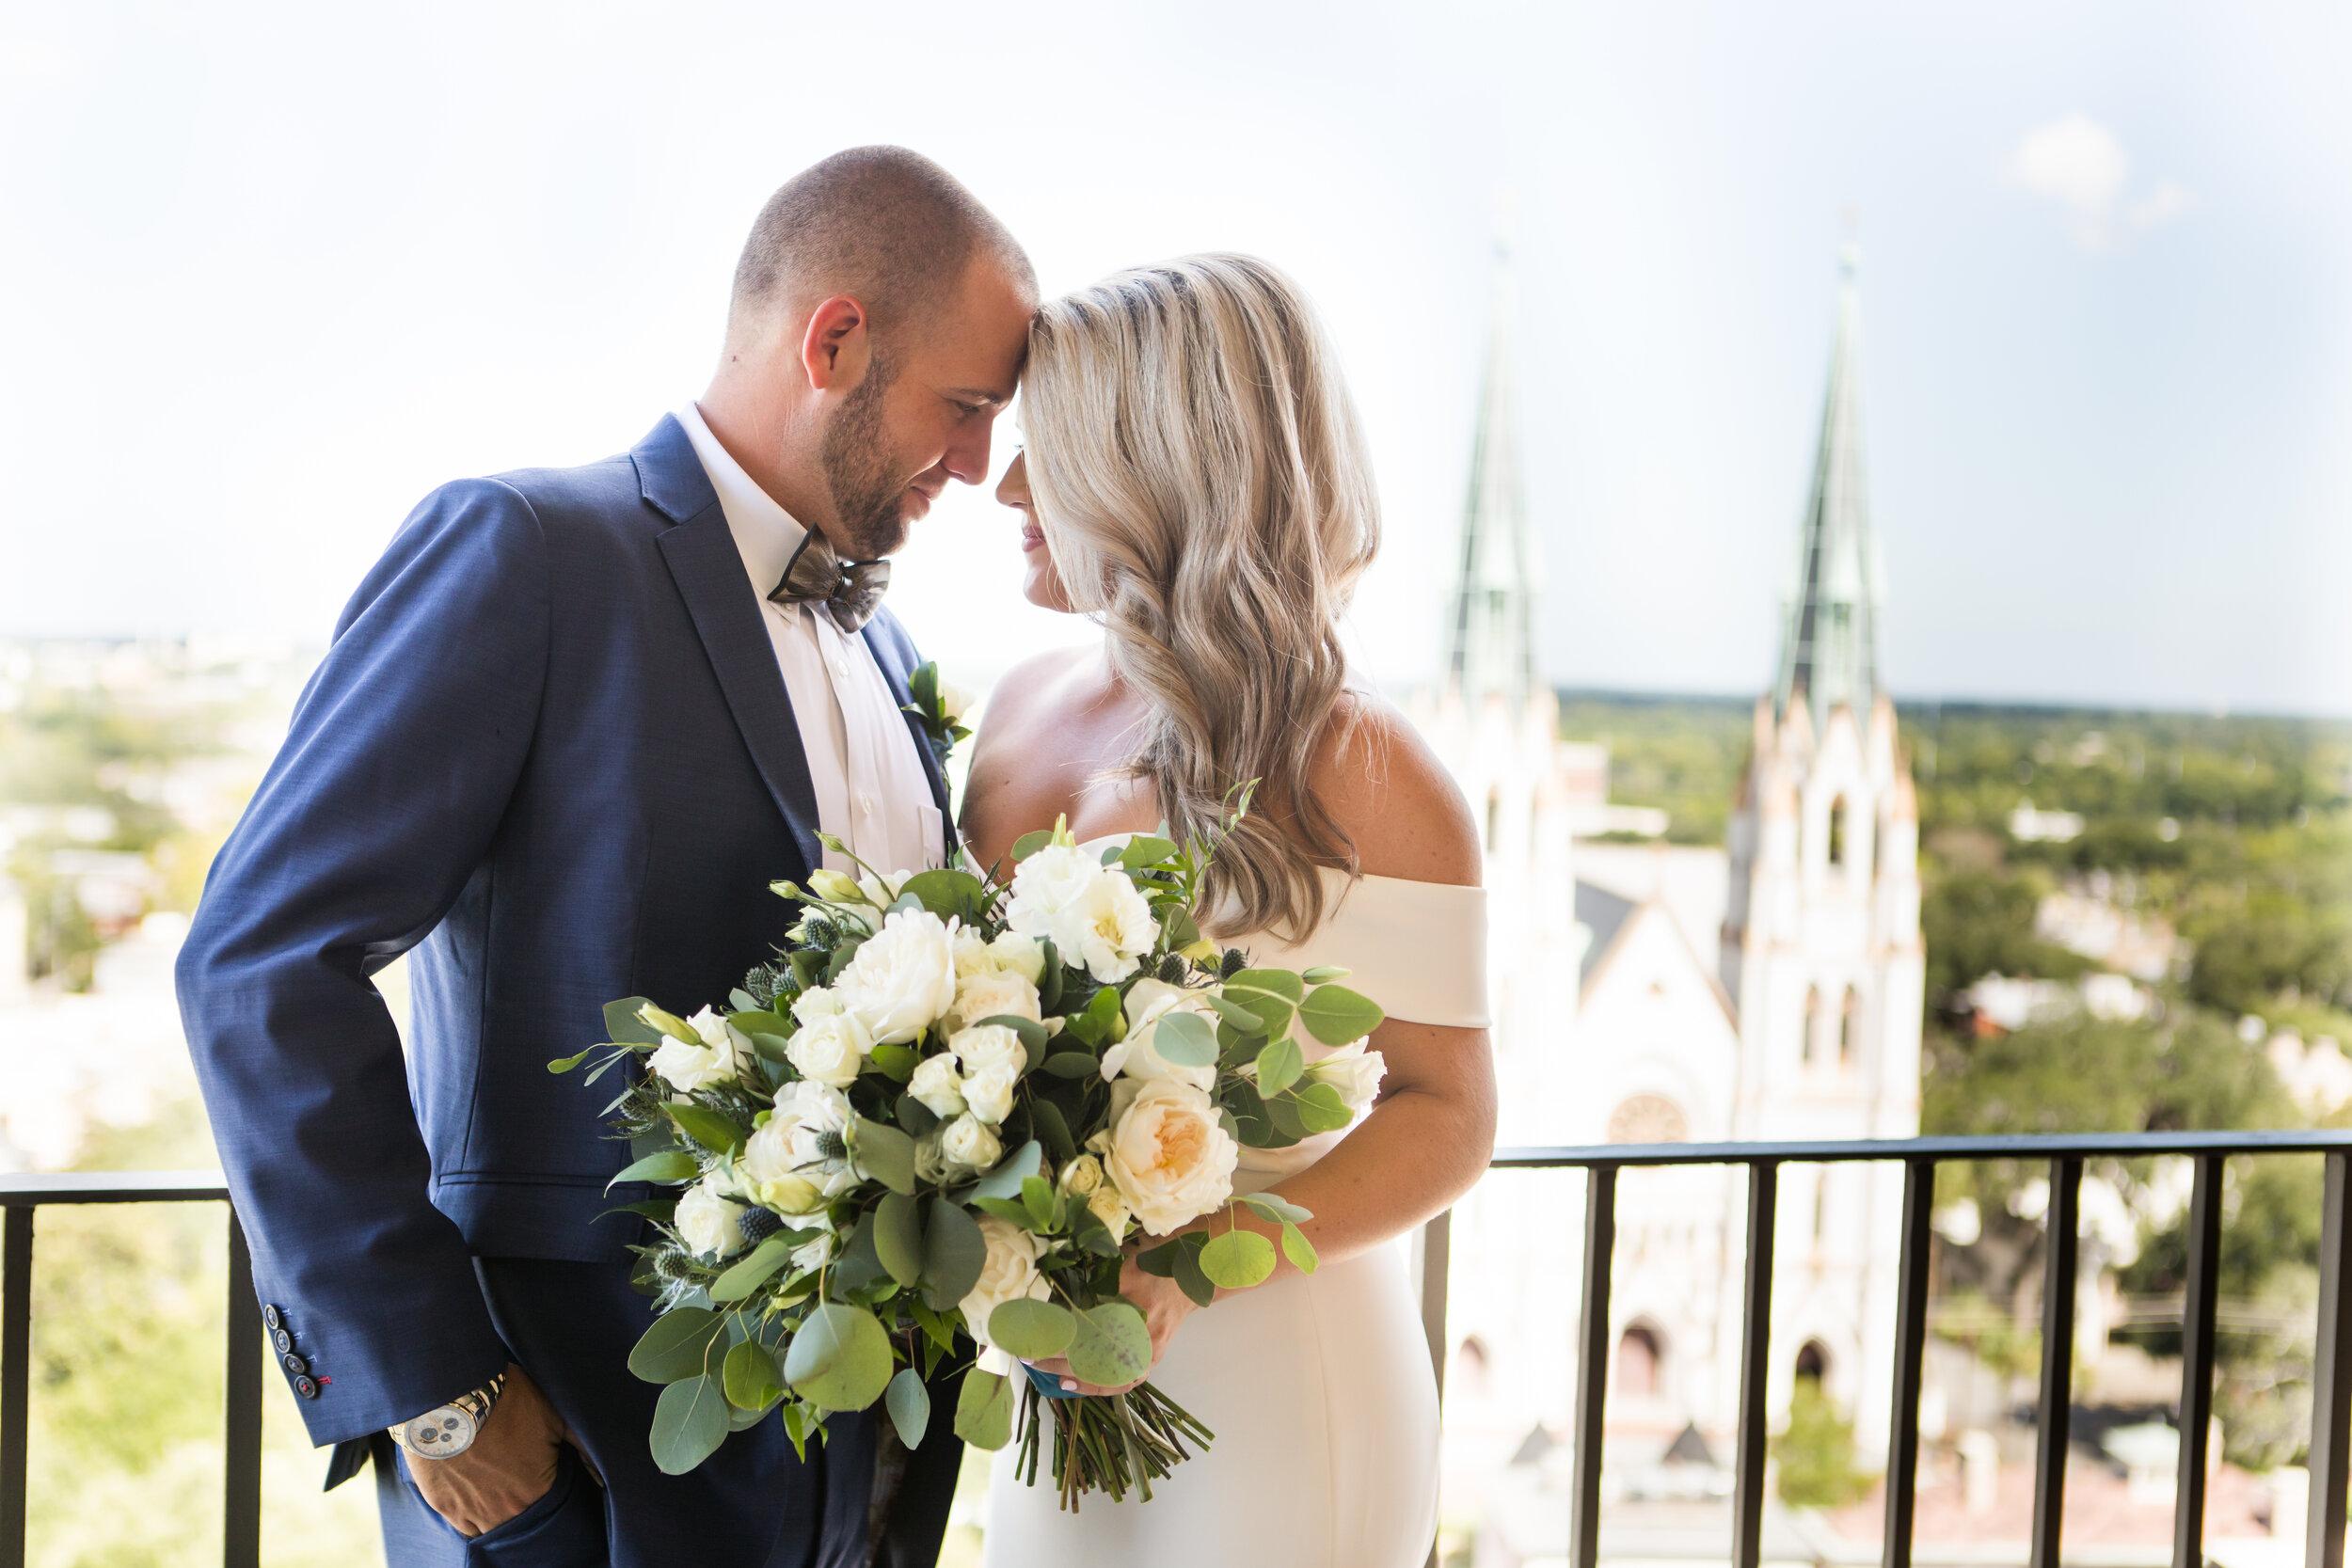 ivory-and-beau-bride-wedding-dresses-bridal-boutique-bridal-shop-savannah-wedding-shop-DGP_SohoSouthCafe_Swanagin-Mullis-129.JPG